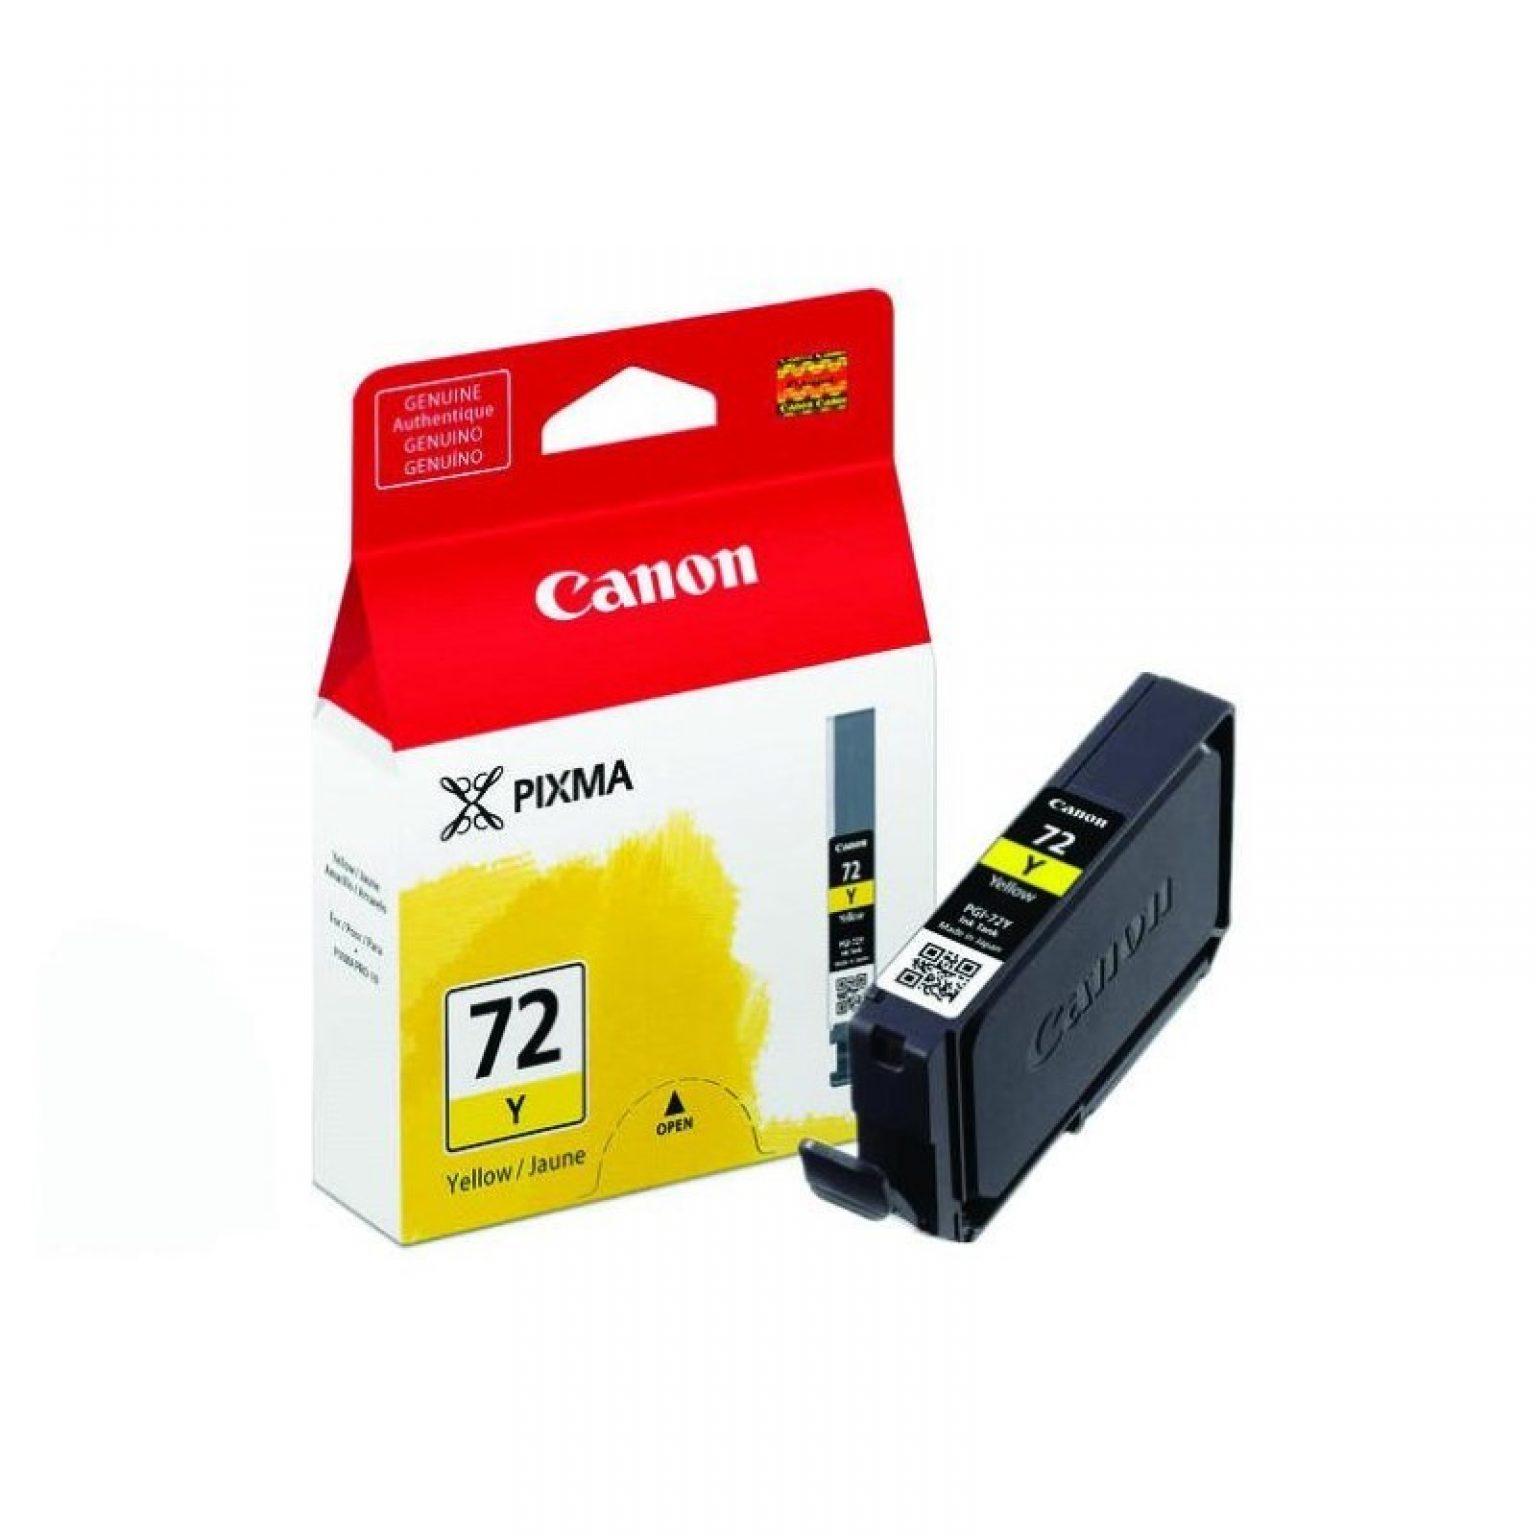 CANON - Ink Cartridge PGI-72 Yellow for Pro-10 [PGI72Y]